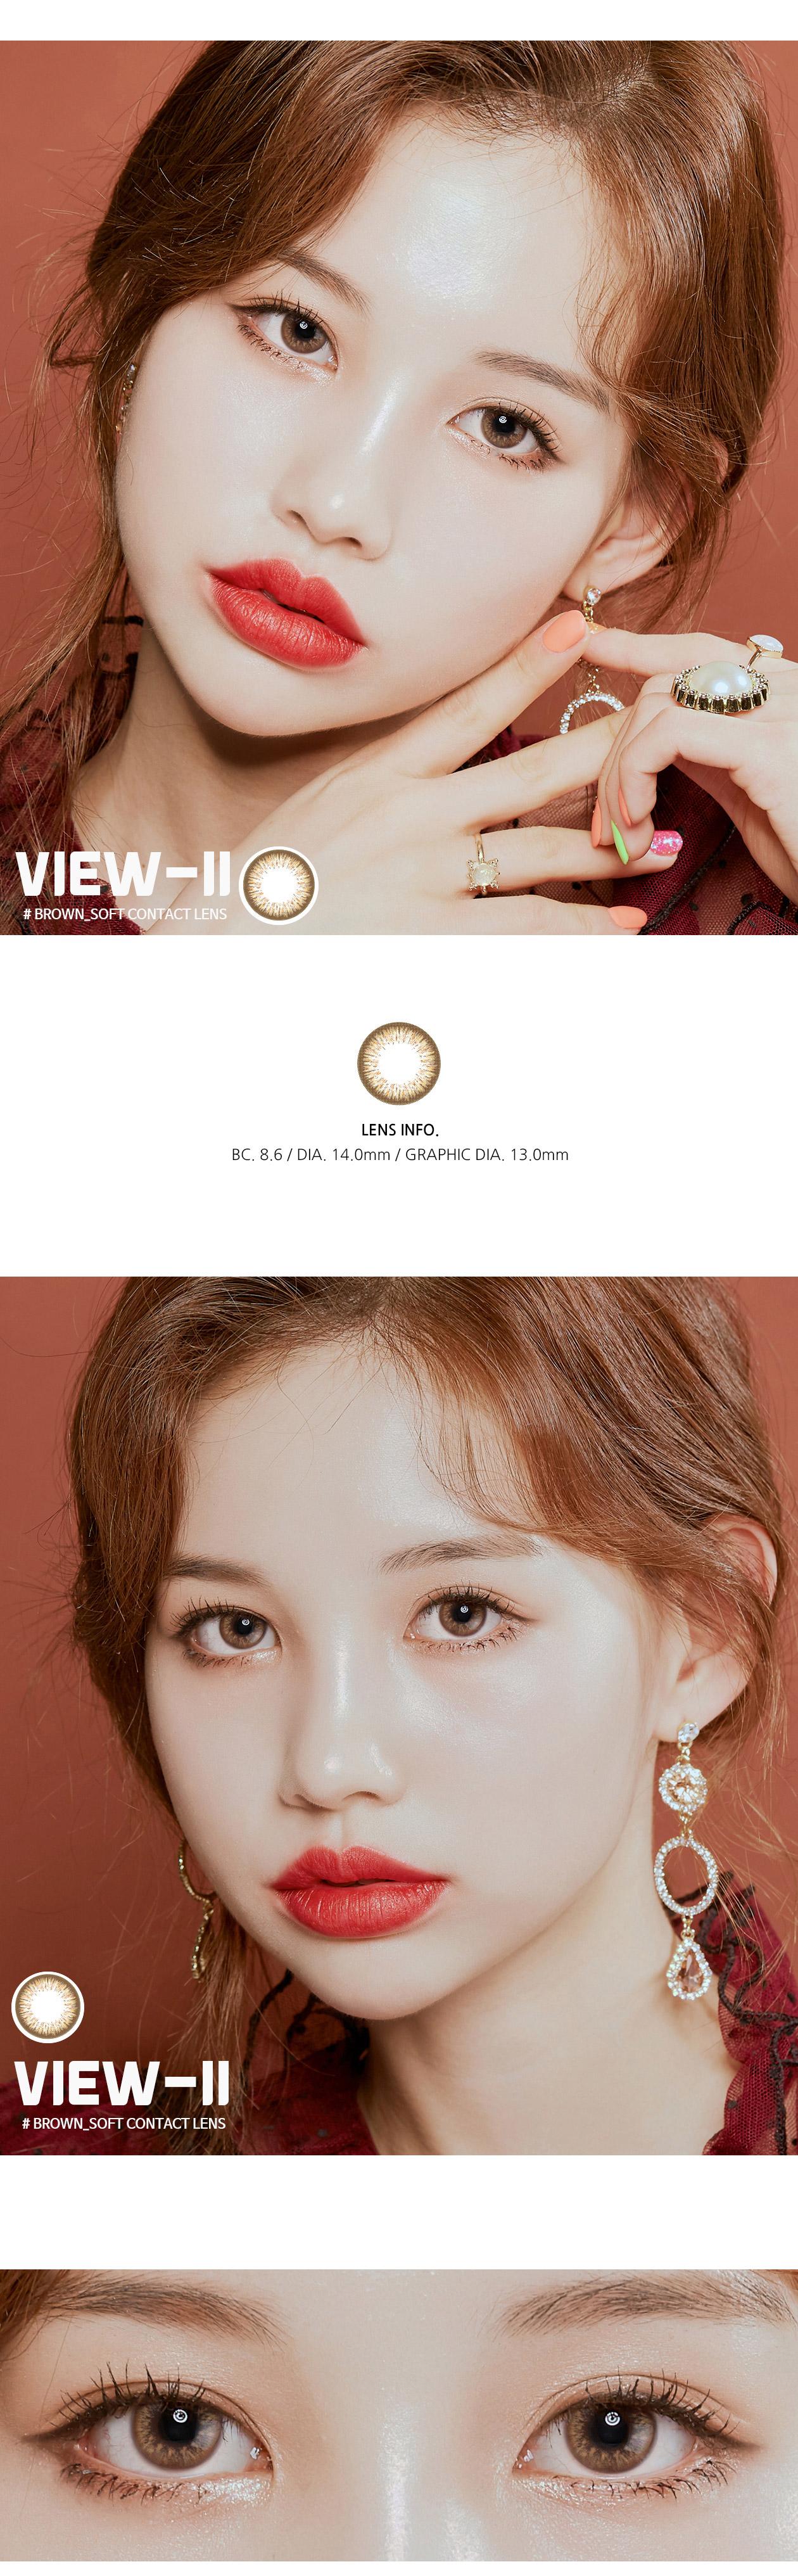 moisture-view2-brown-circle-lenses1.jpg